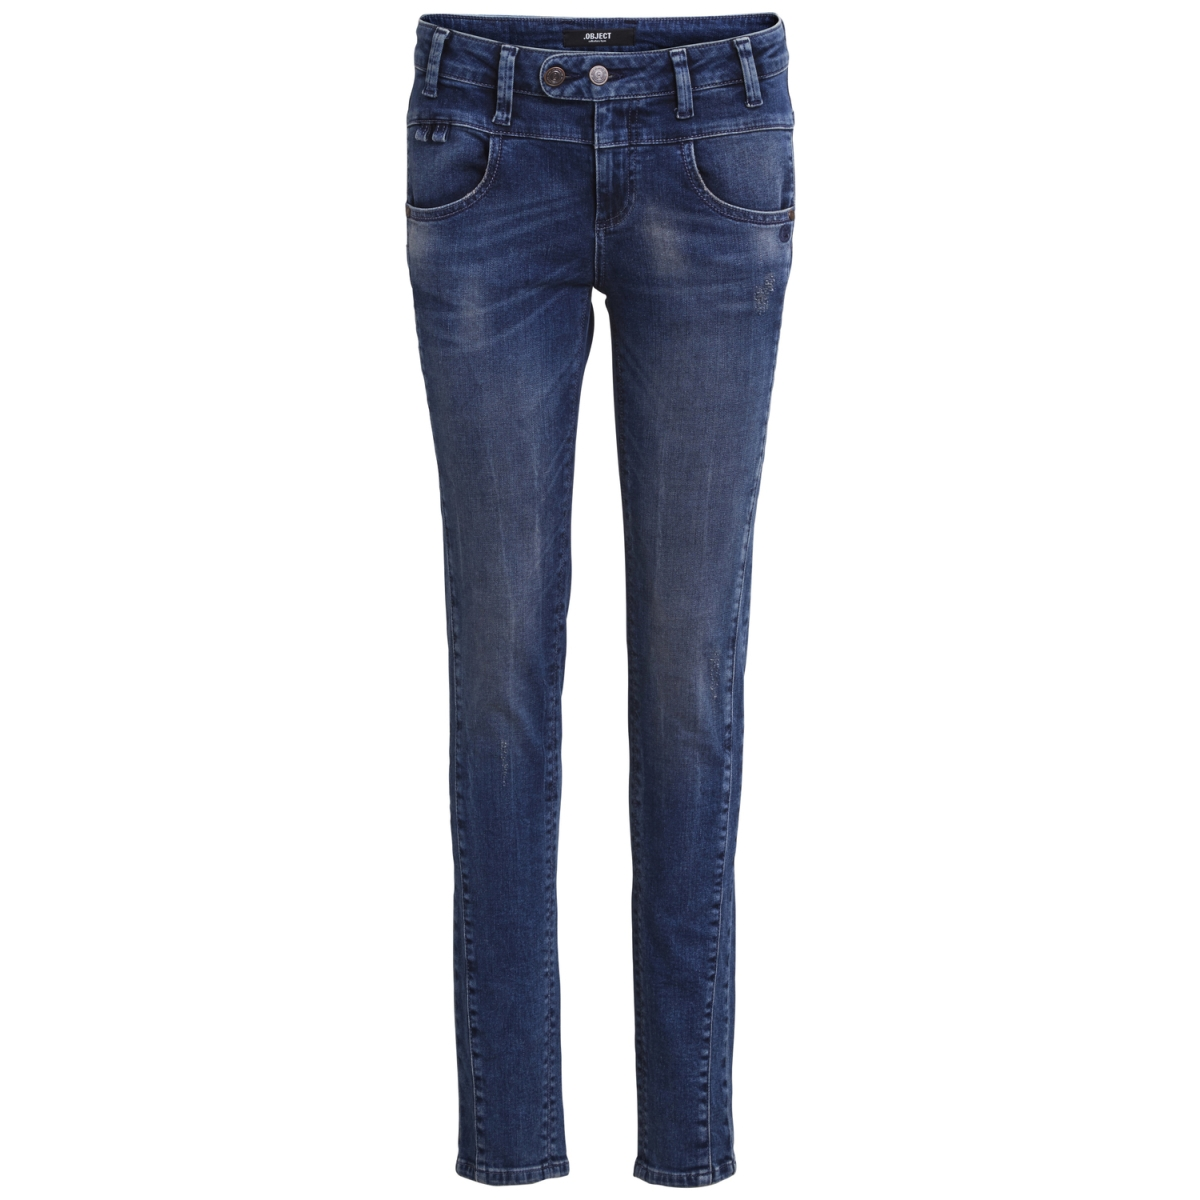 objup-c super stretch obb258 92 div 23025678 object jeans dark blue denim